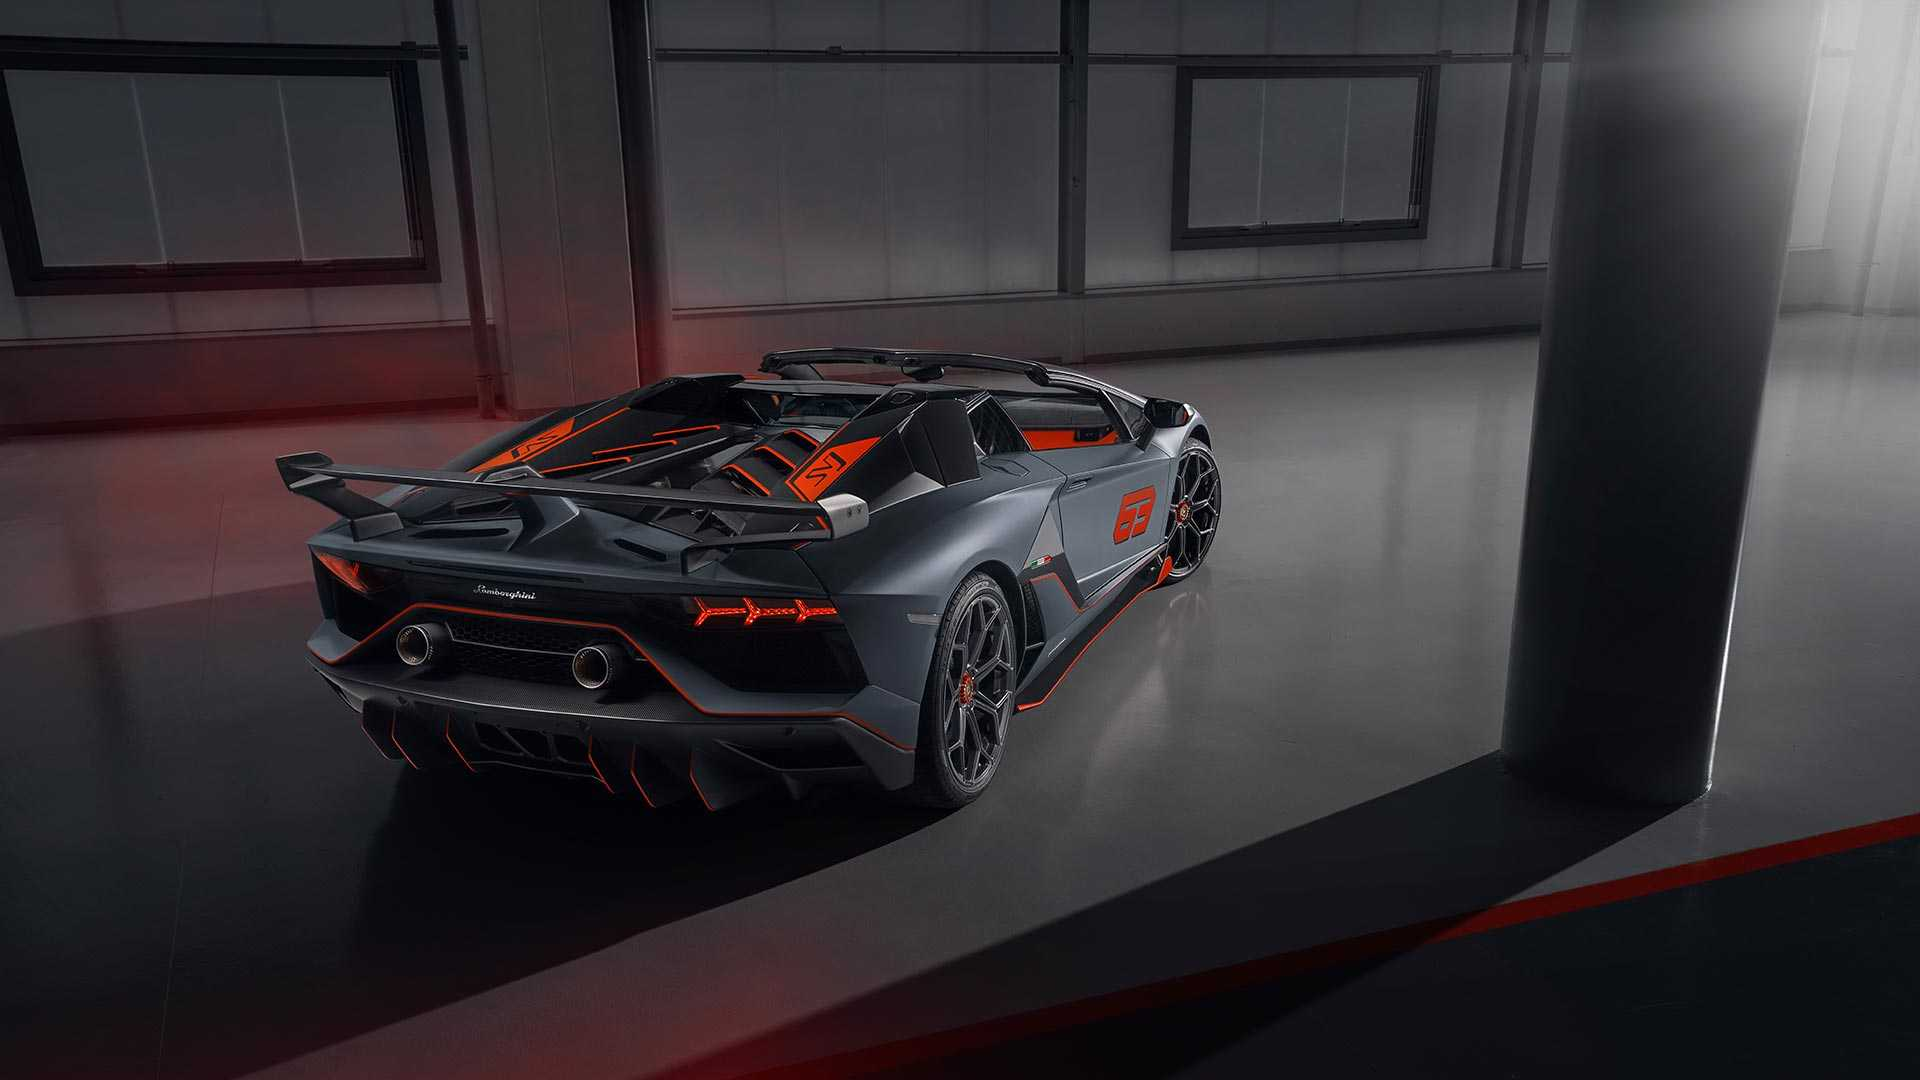 2020 Lamborghini Aventador Svj 63 Roadster Review